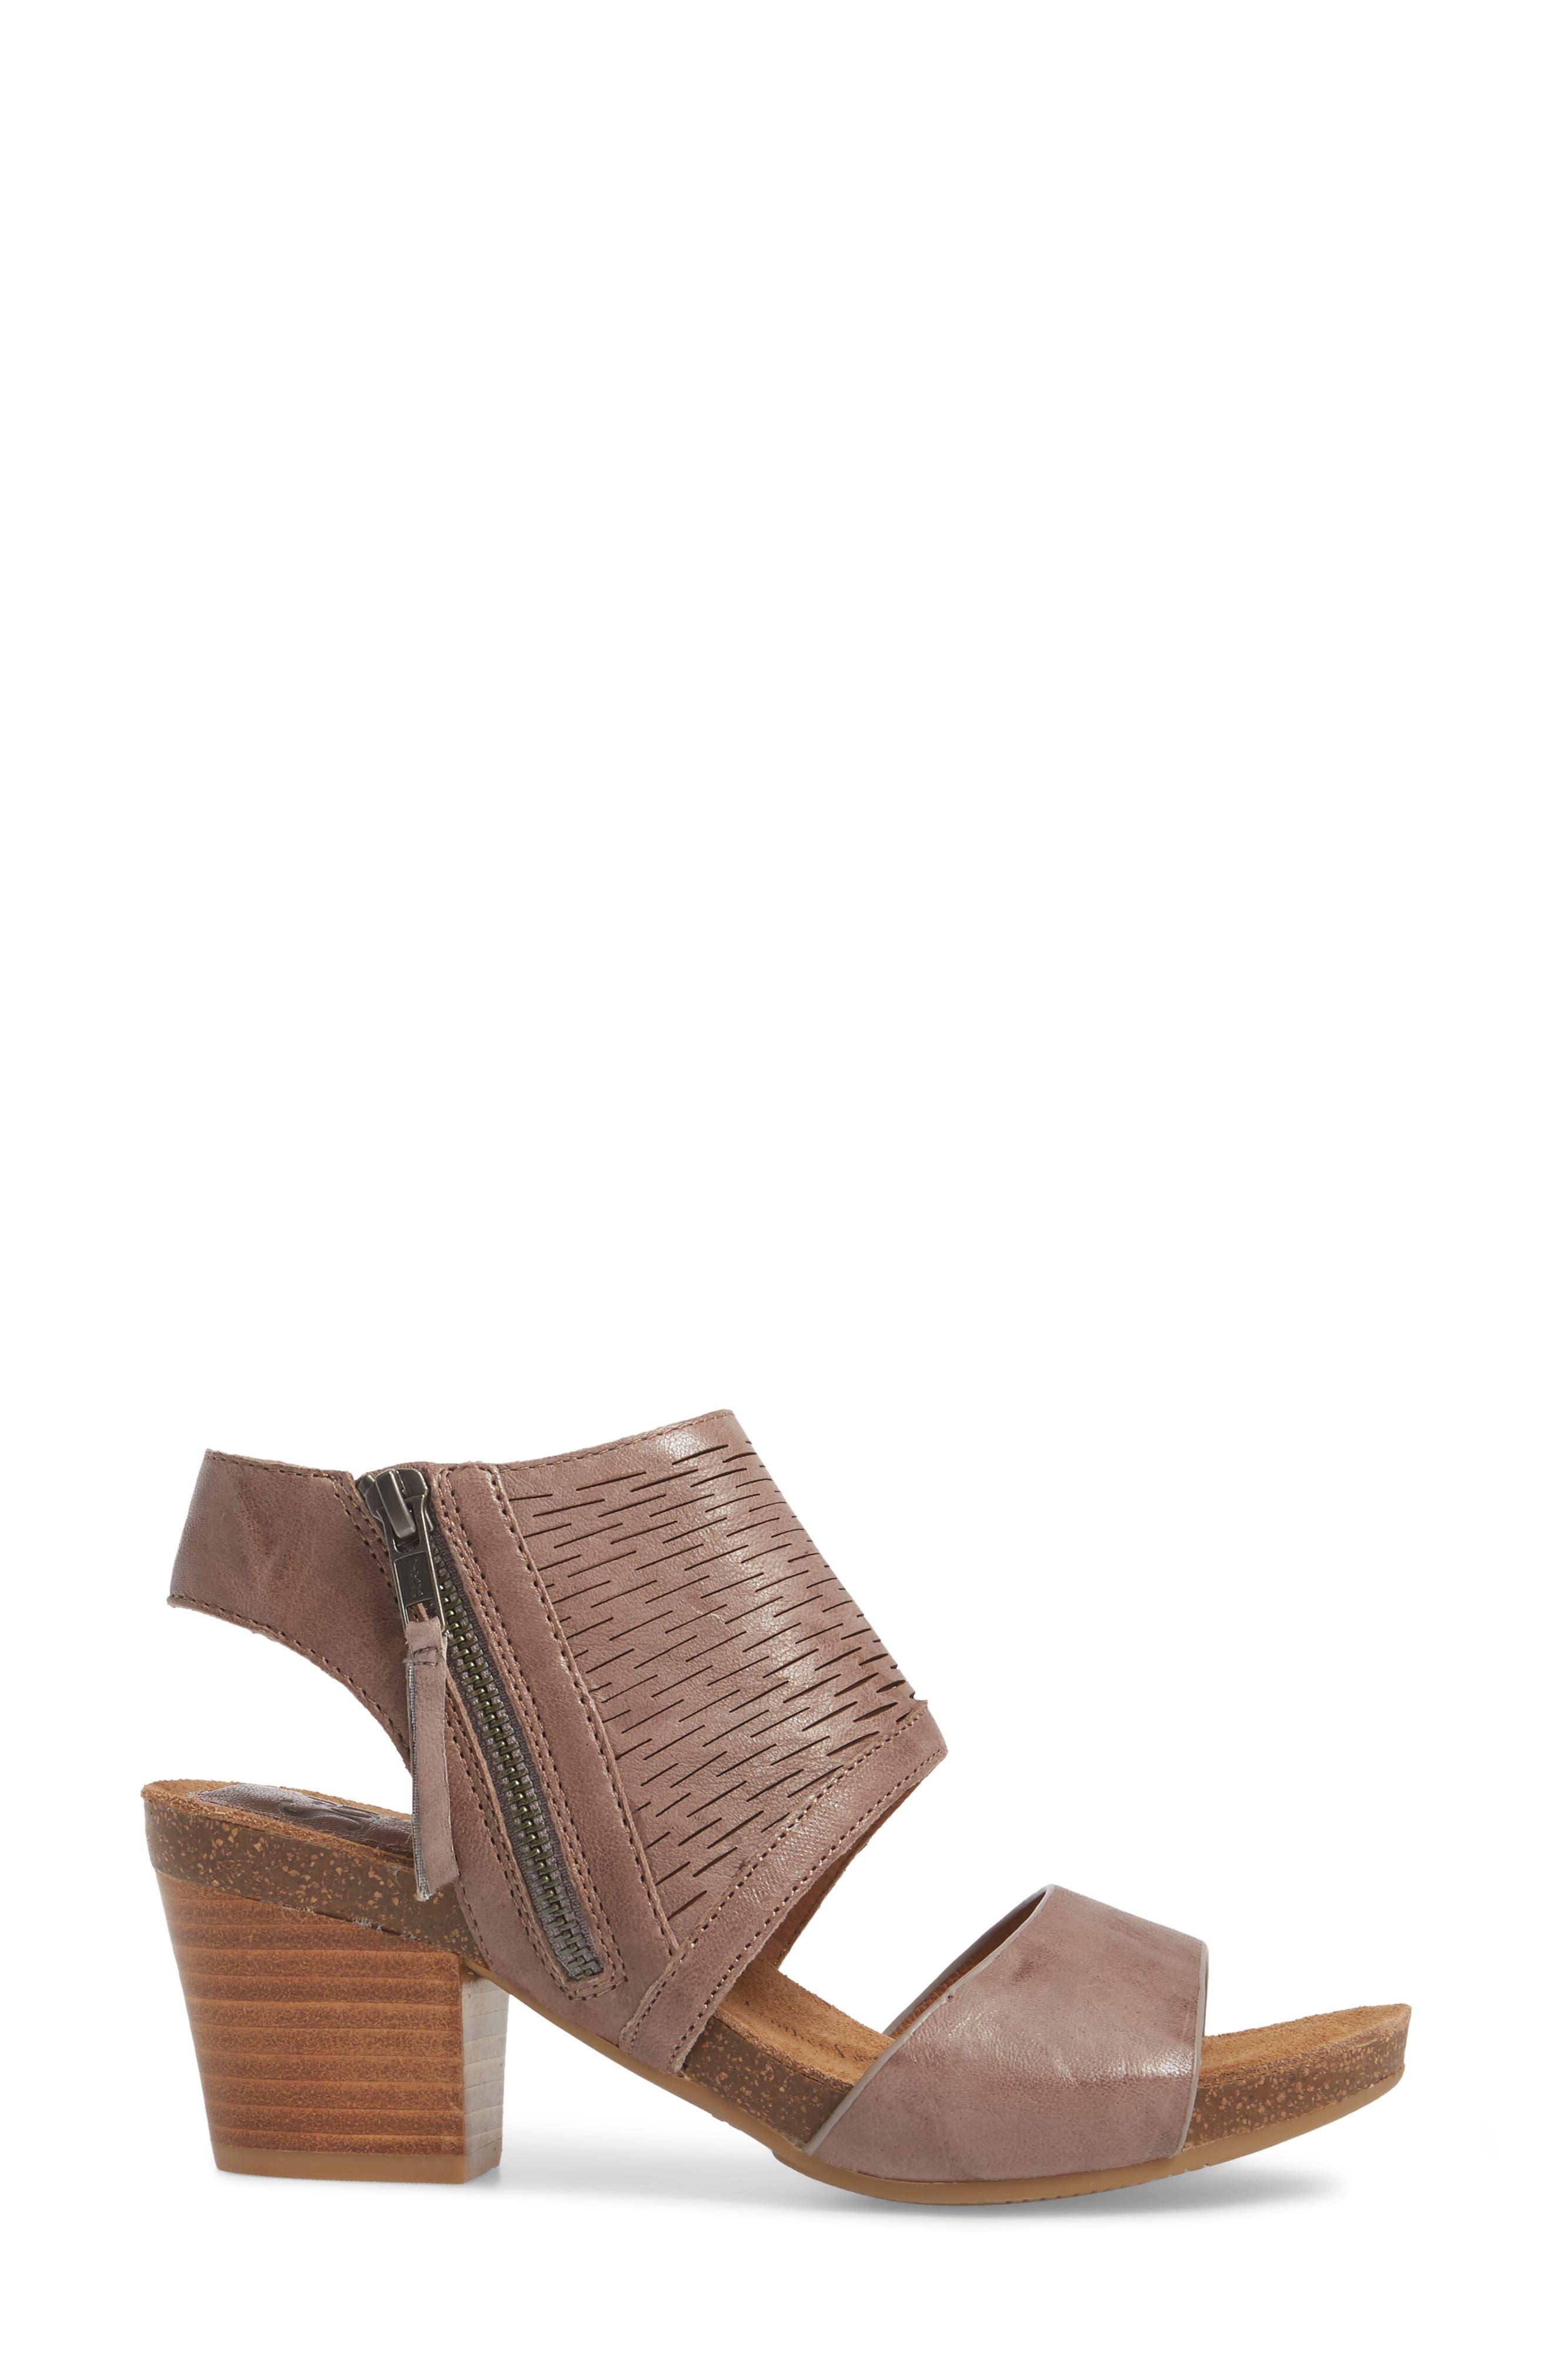 Alternate Image 3  - Söfft Milan Block Heel Sandal (Women)